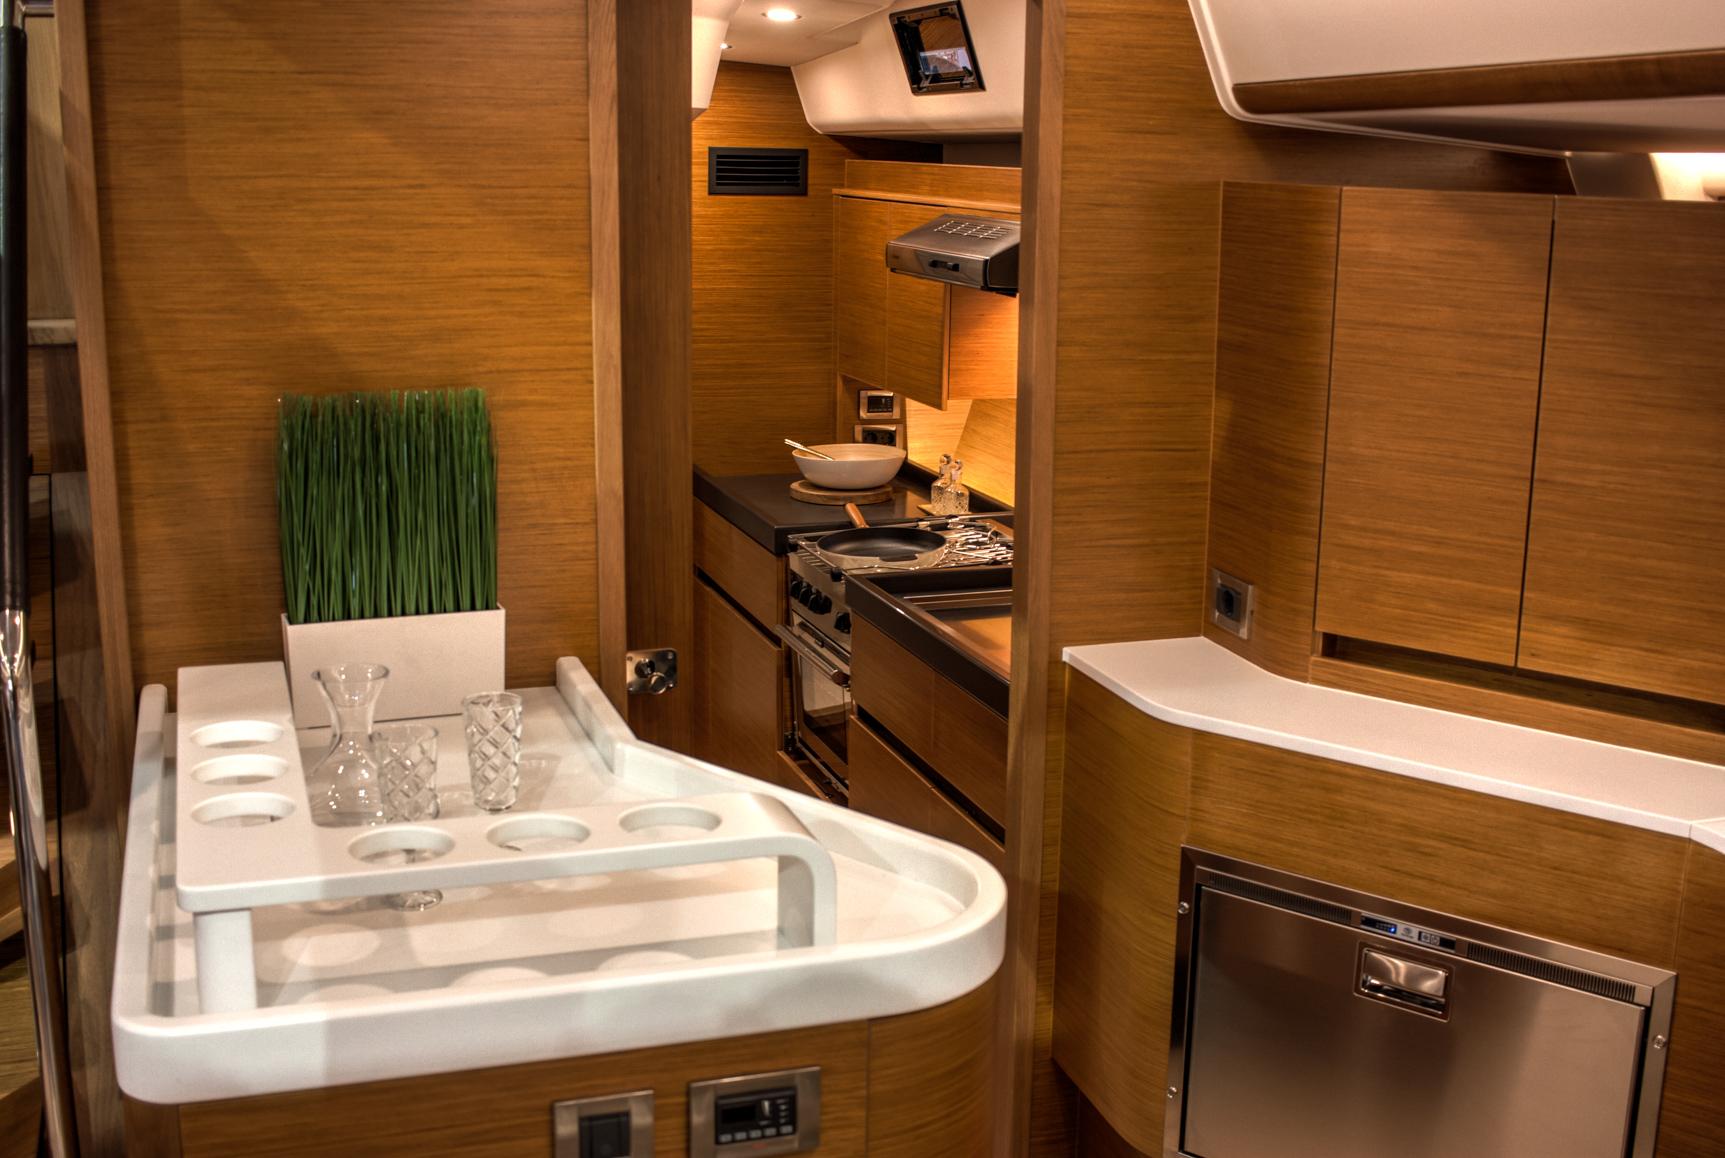 18 hanse675 pantry k che skipper. Black Bedroom Furniture Sets. Home Design Ideas